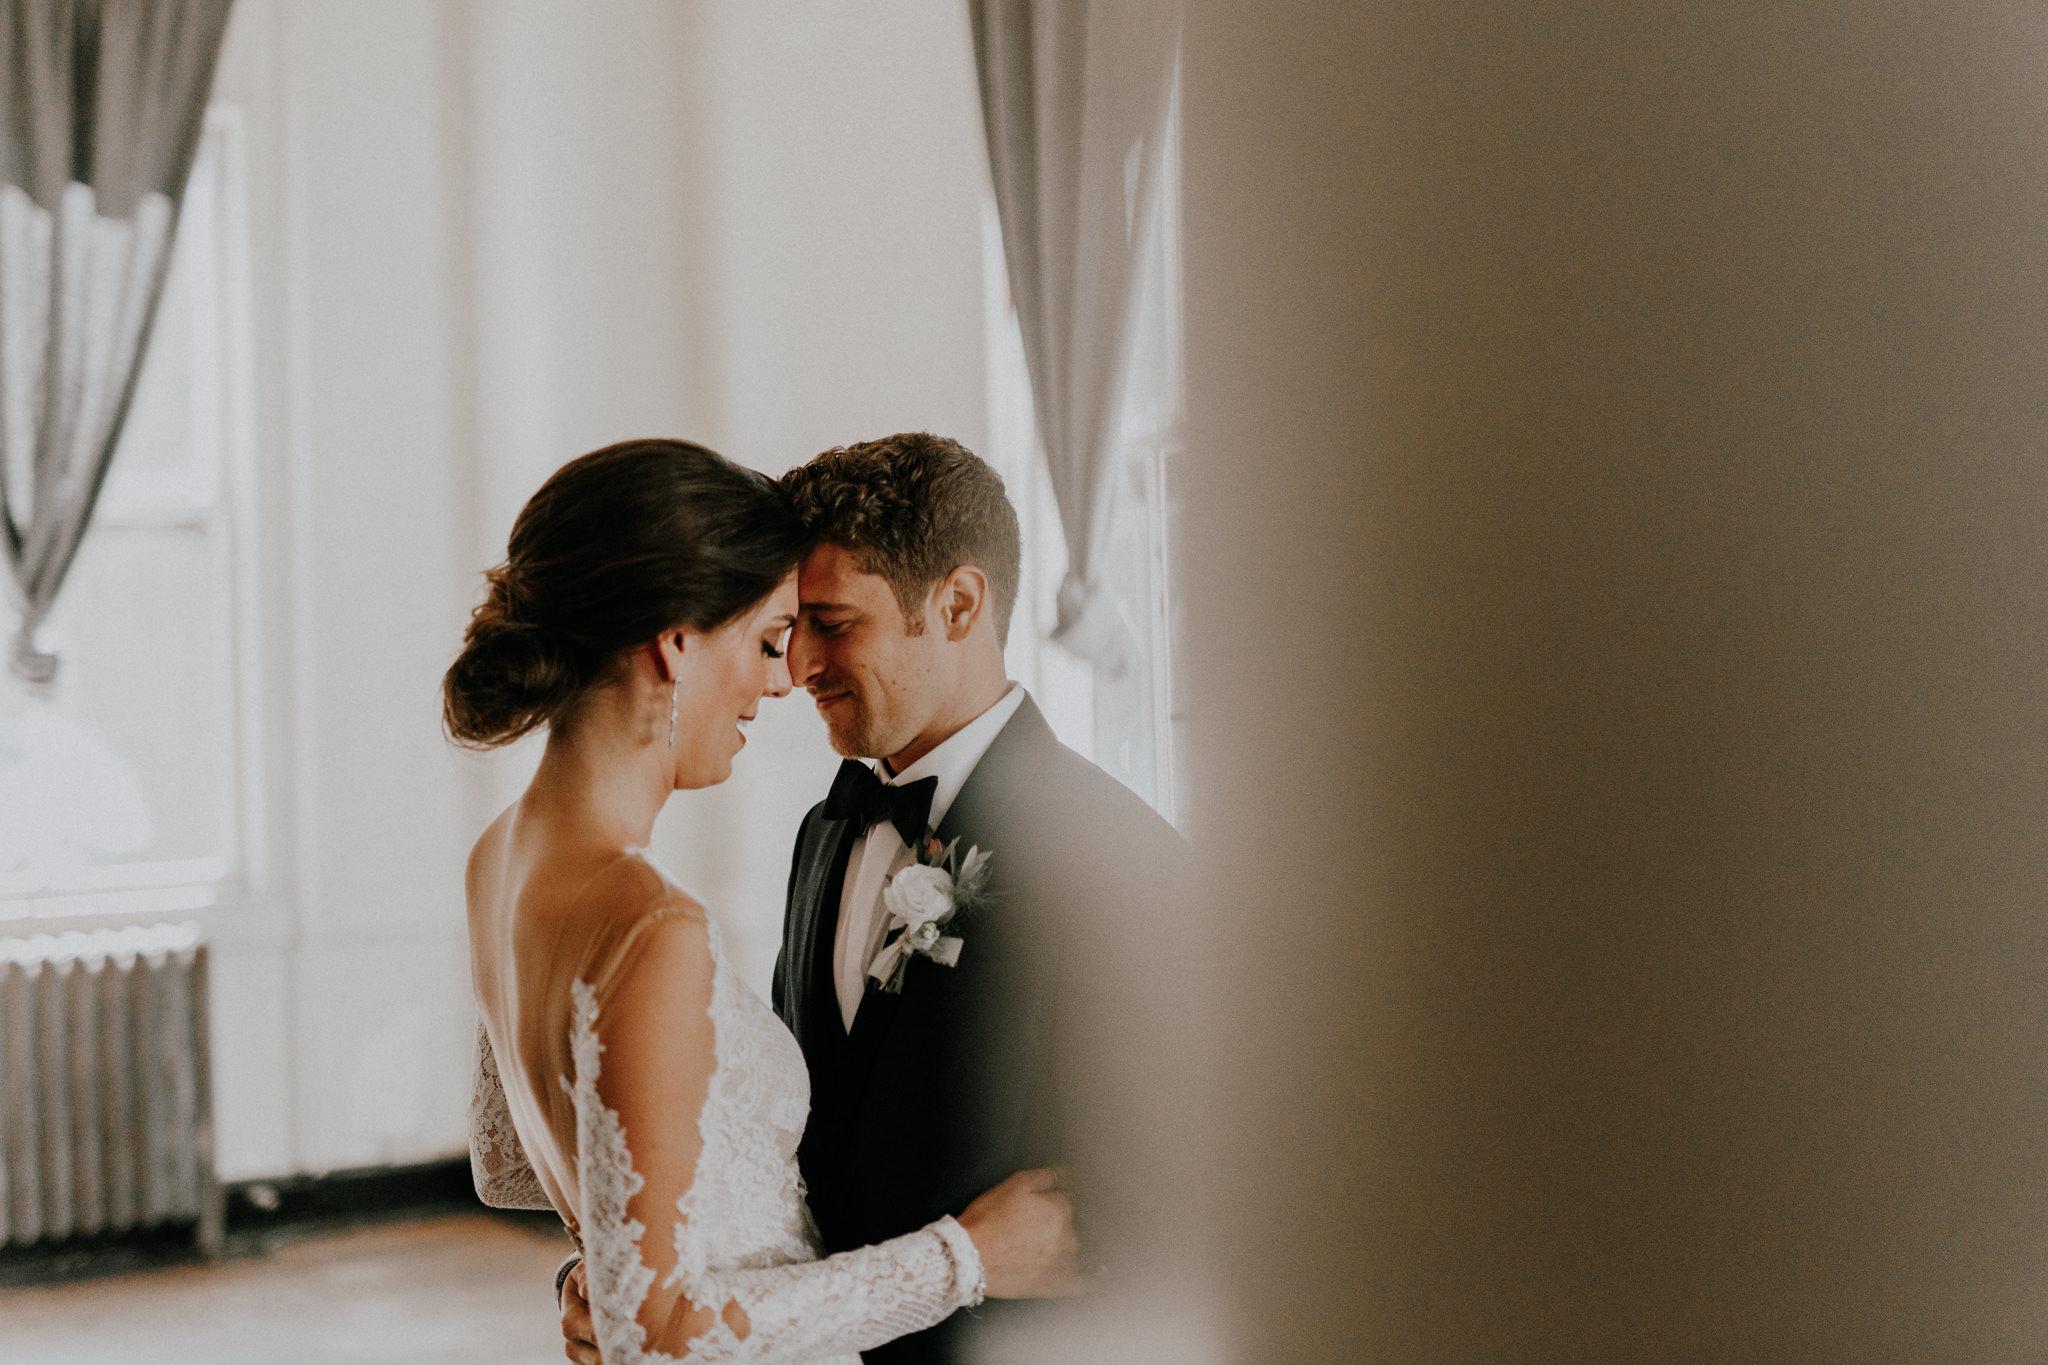 wedding-headlands-center-for-the-arts-sausalito-32.jpg